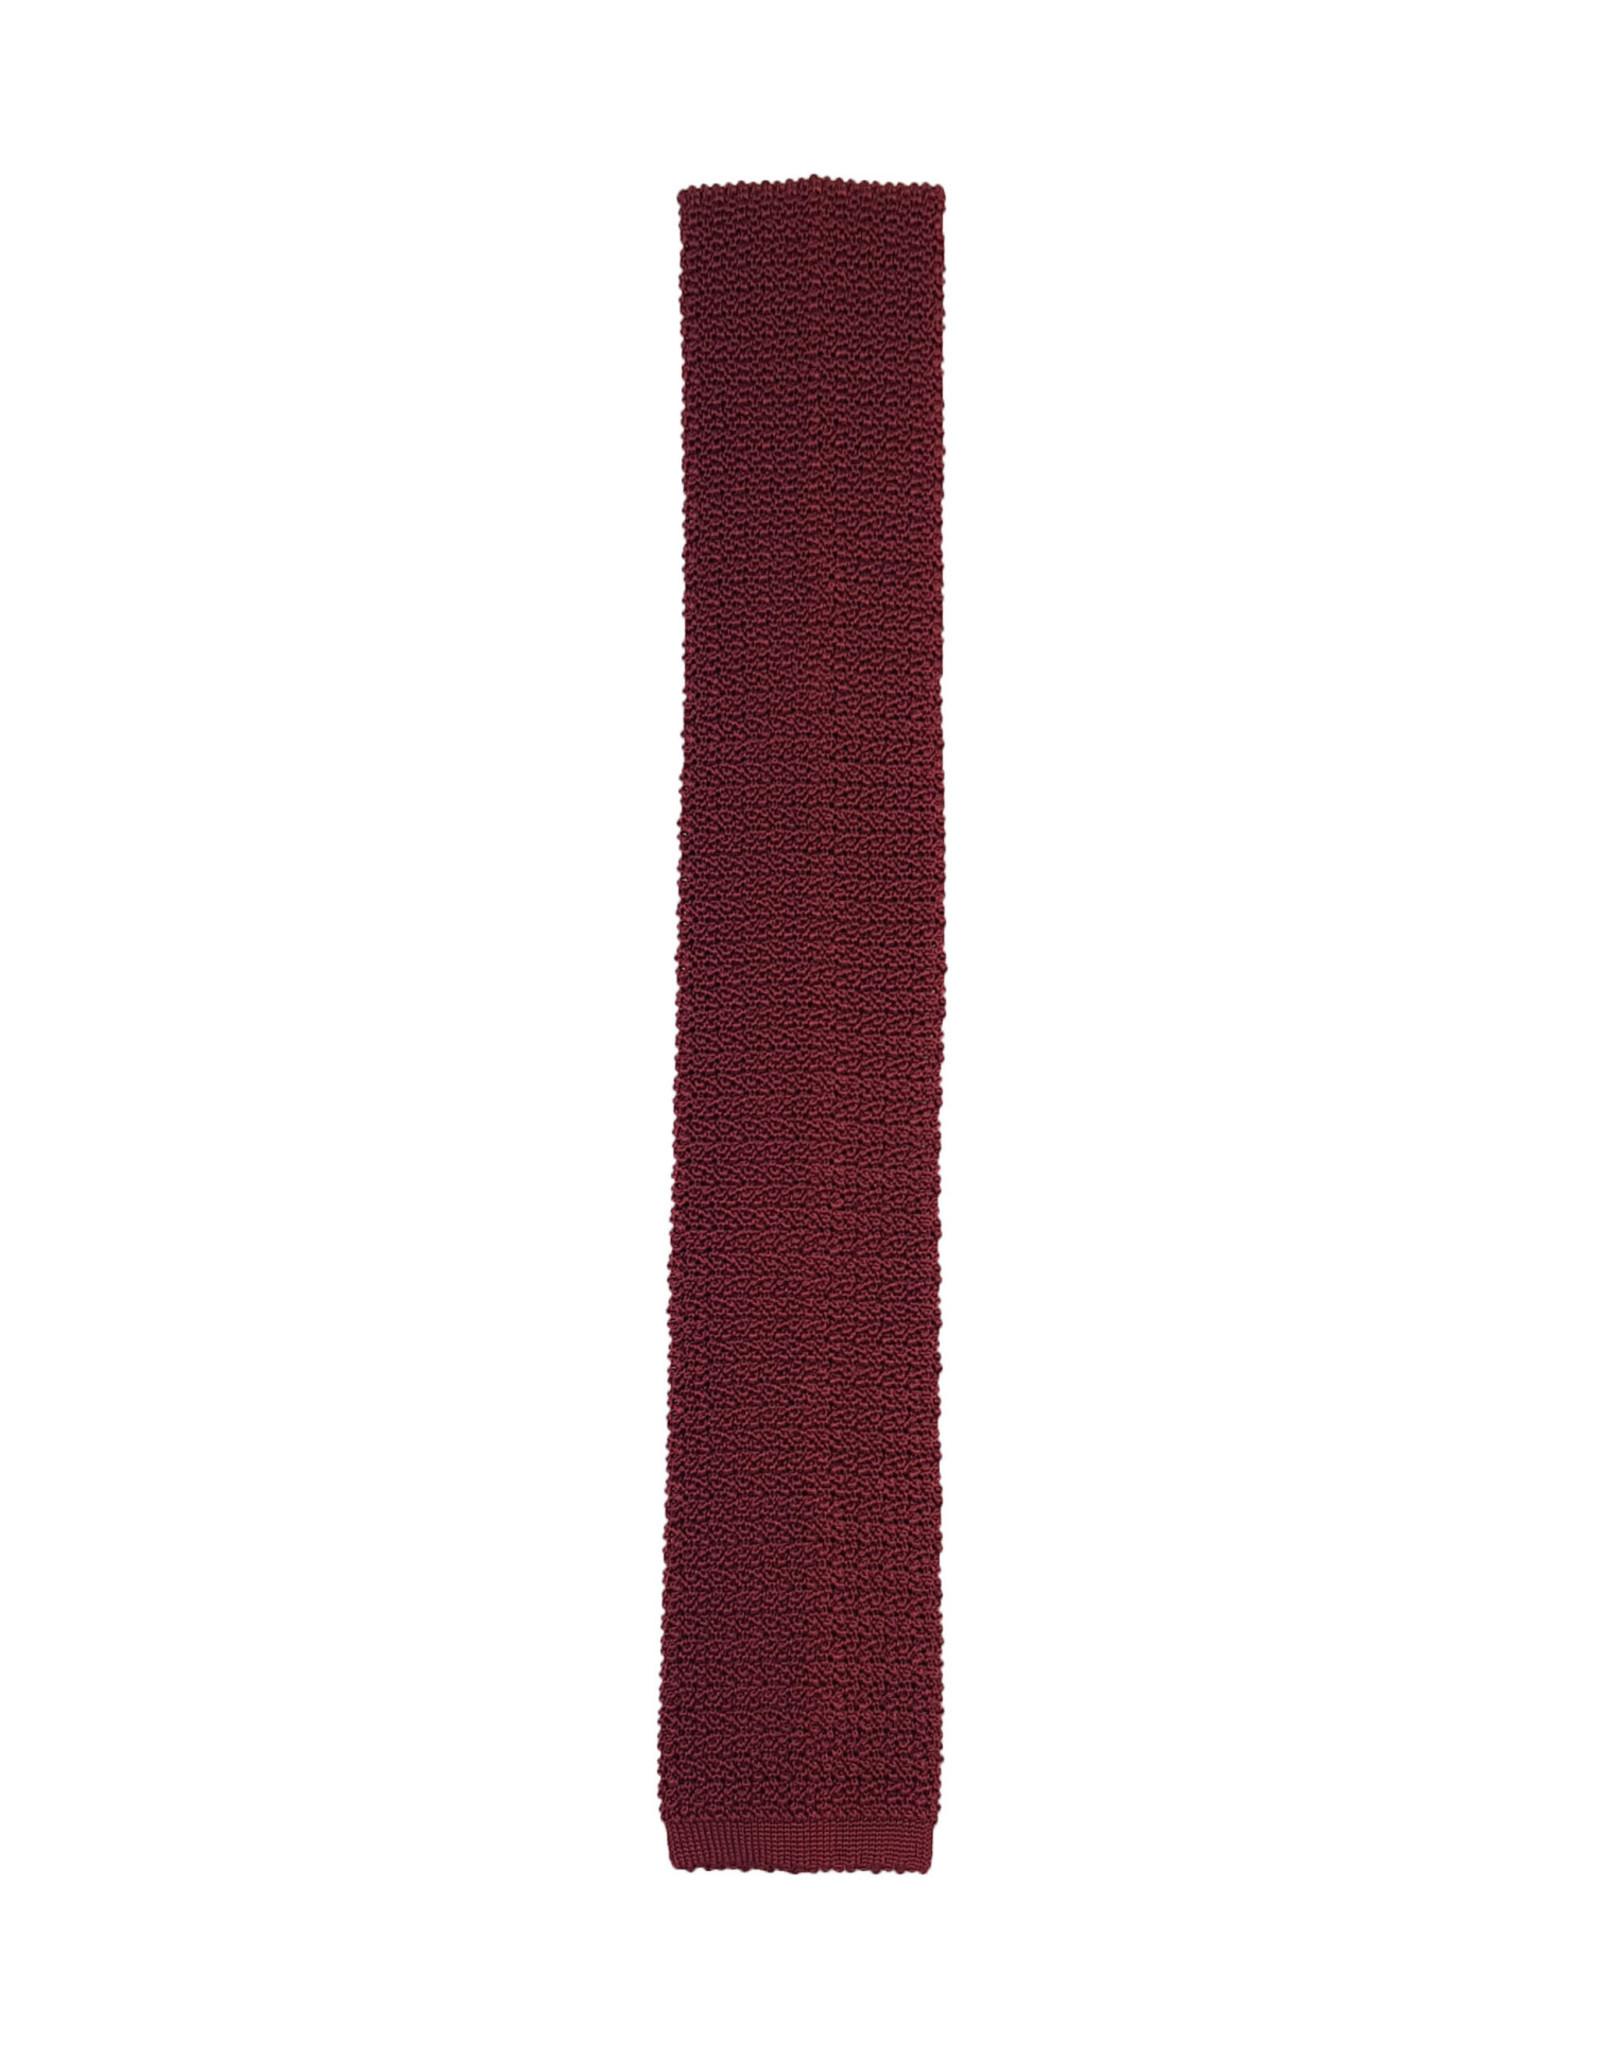 Ascot Sandmore's gebreide das bordeaux 631502/7